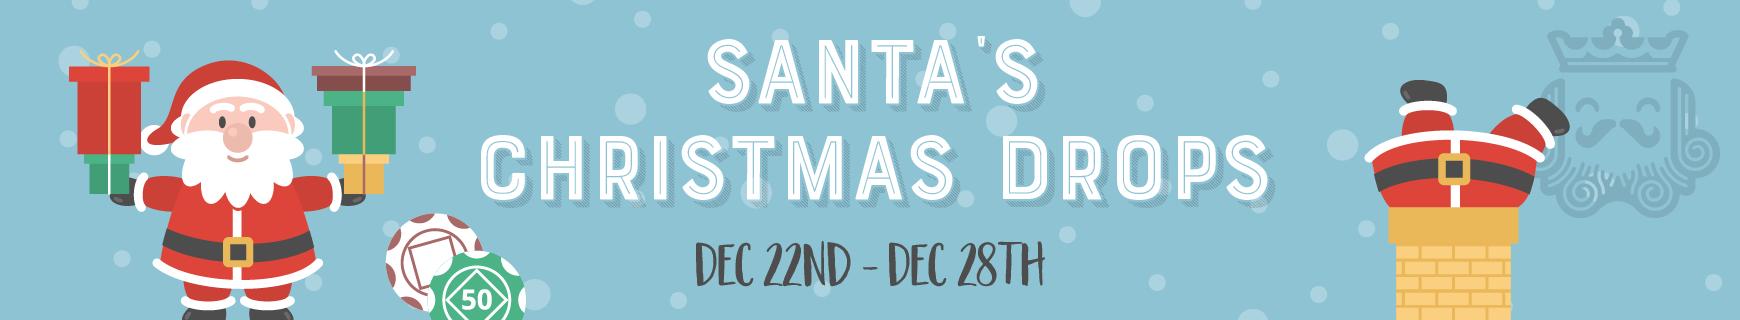 Santa's christmas drops %28870 x 160%29 2x